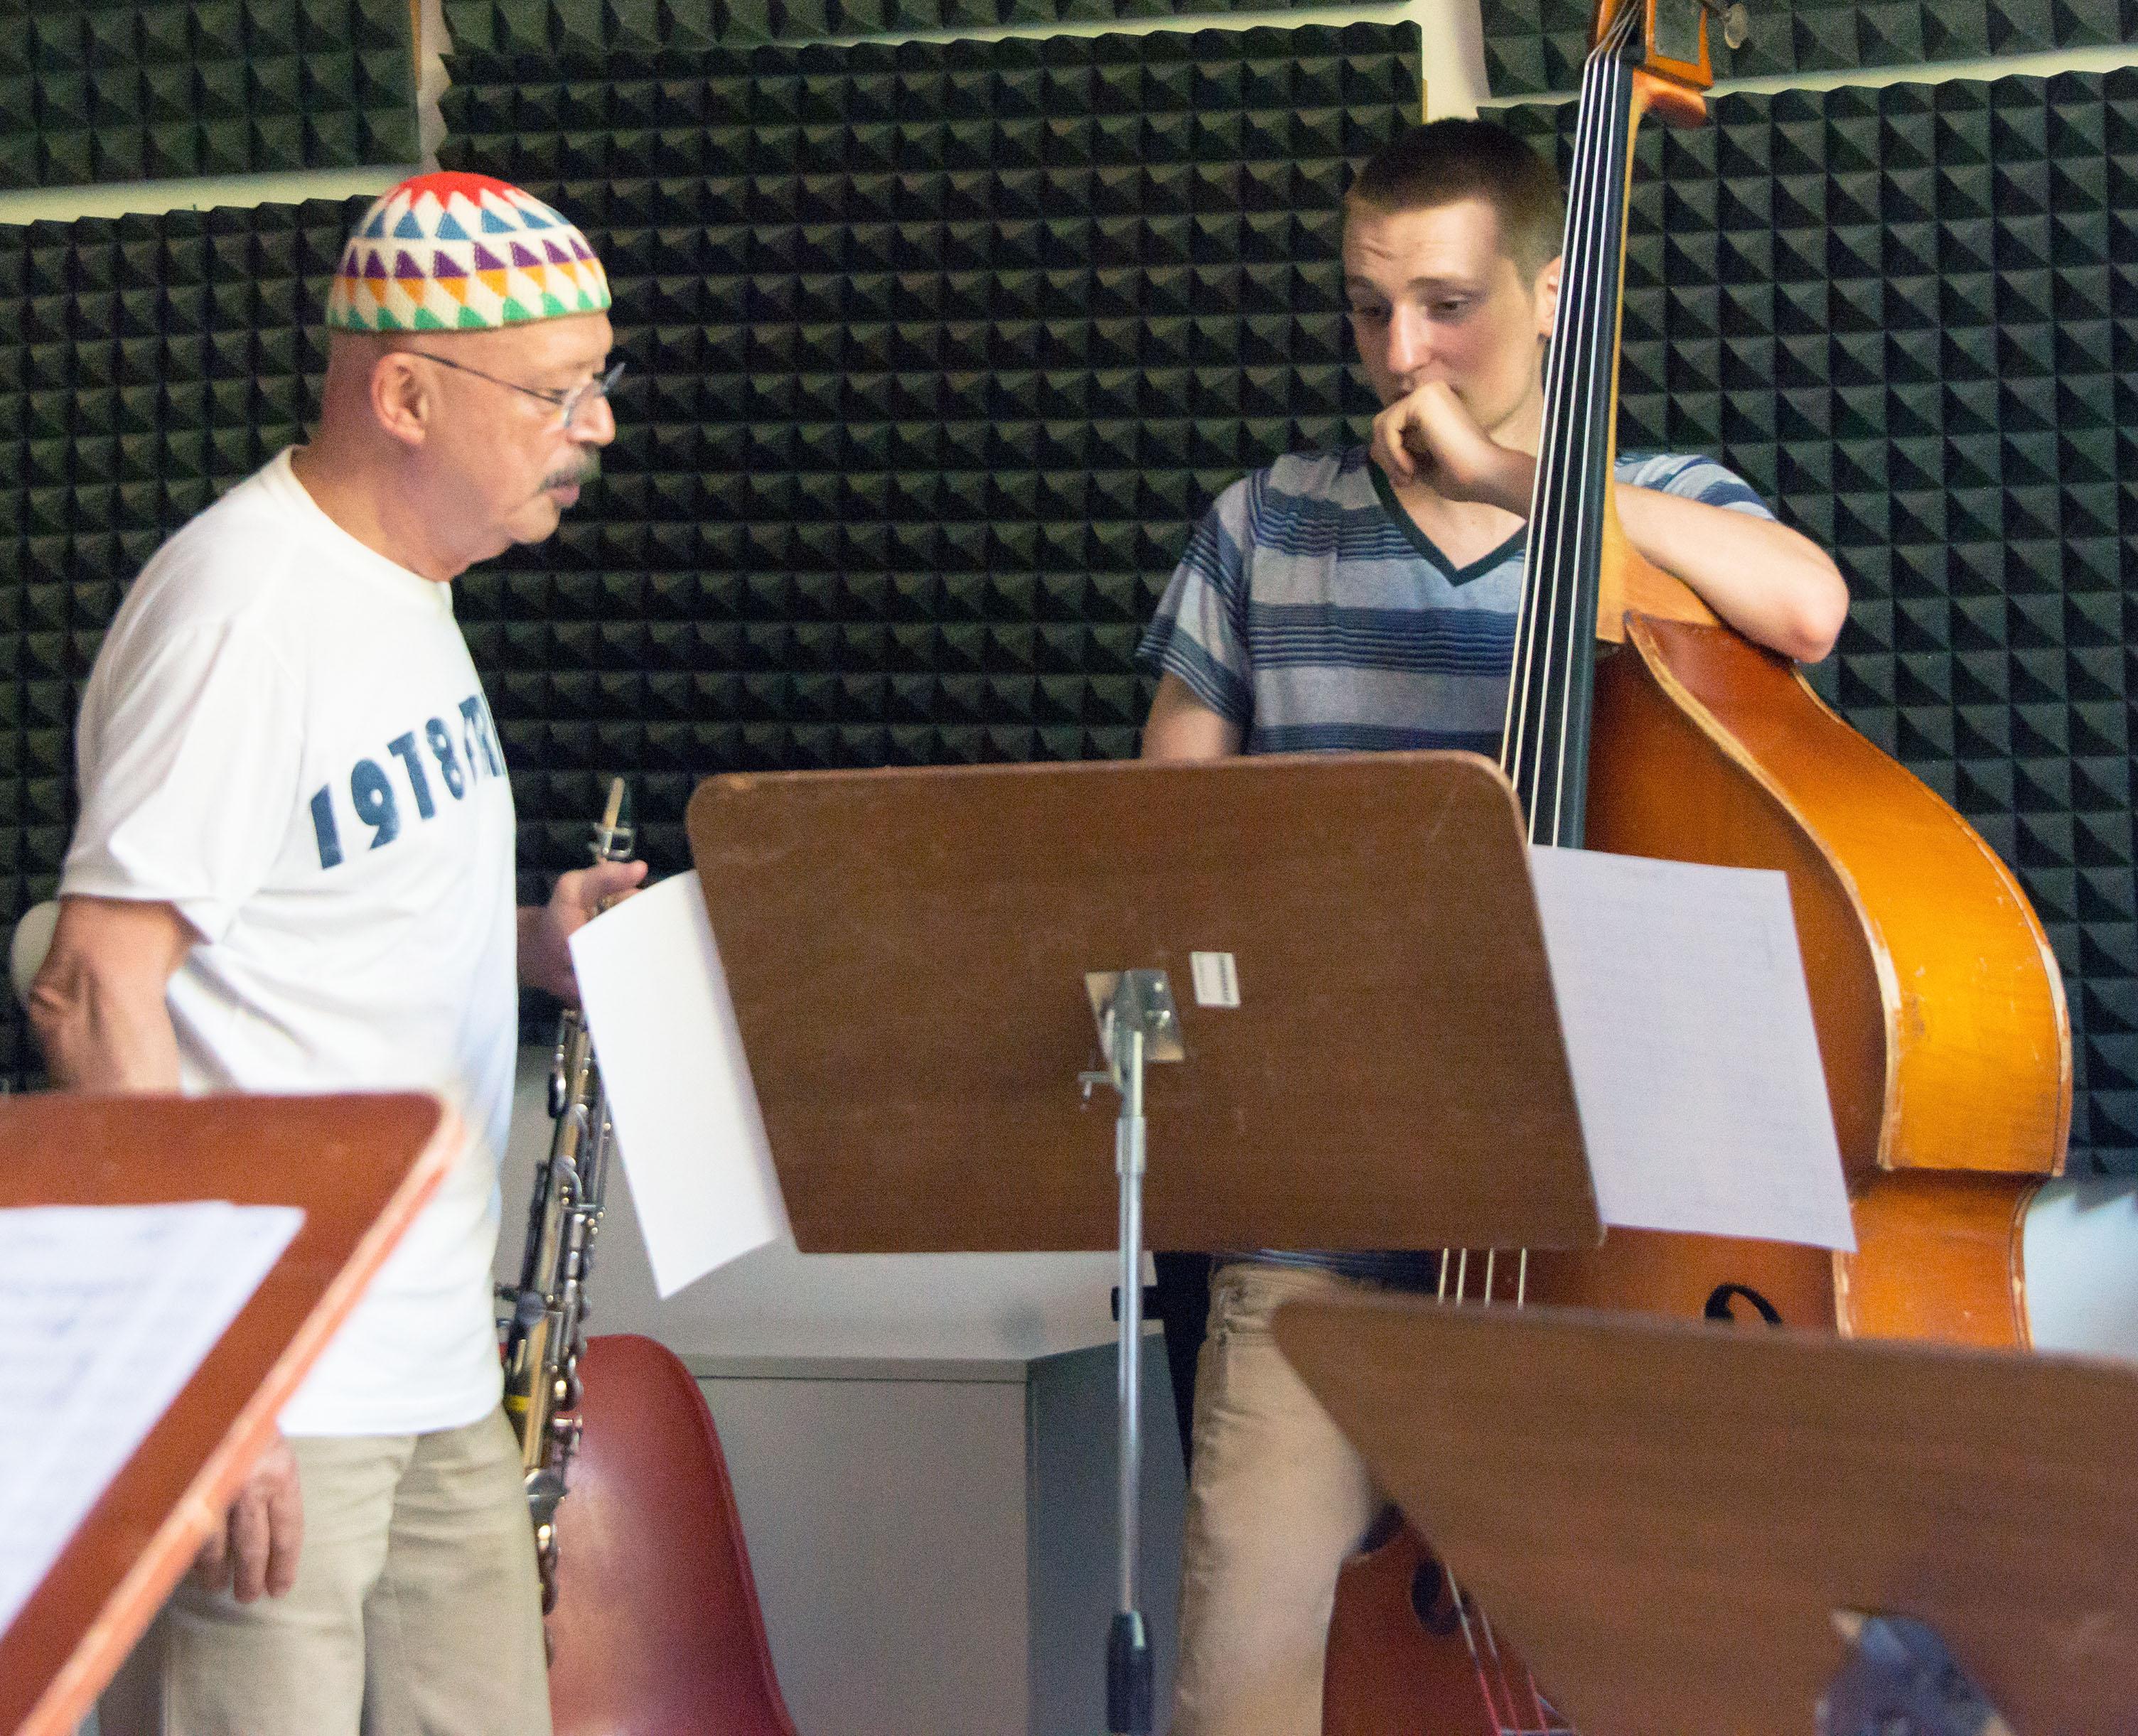 Claudio fasoli combo class, 2013 siena jazz academy summer works